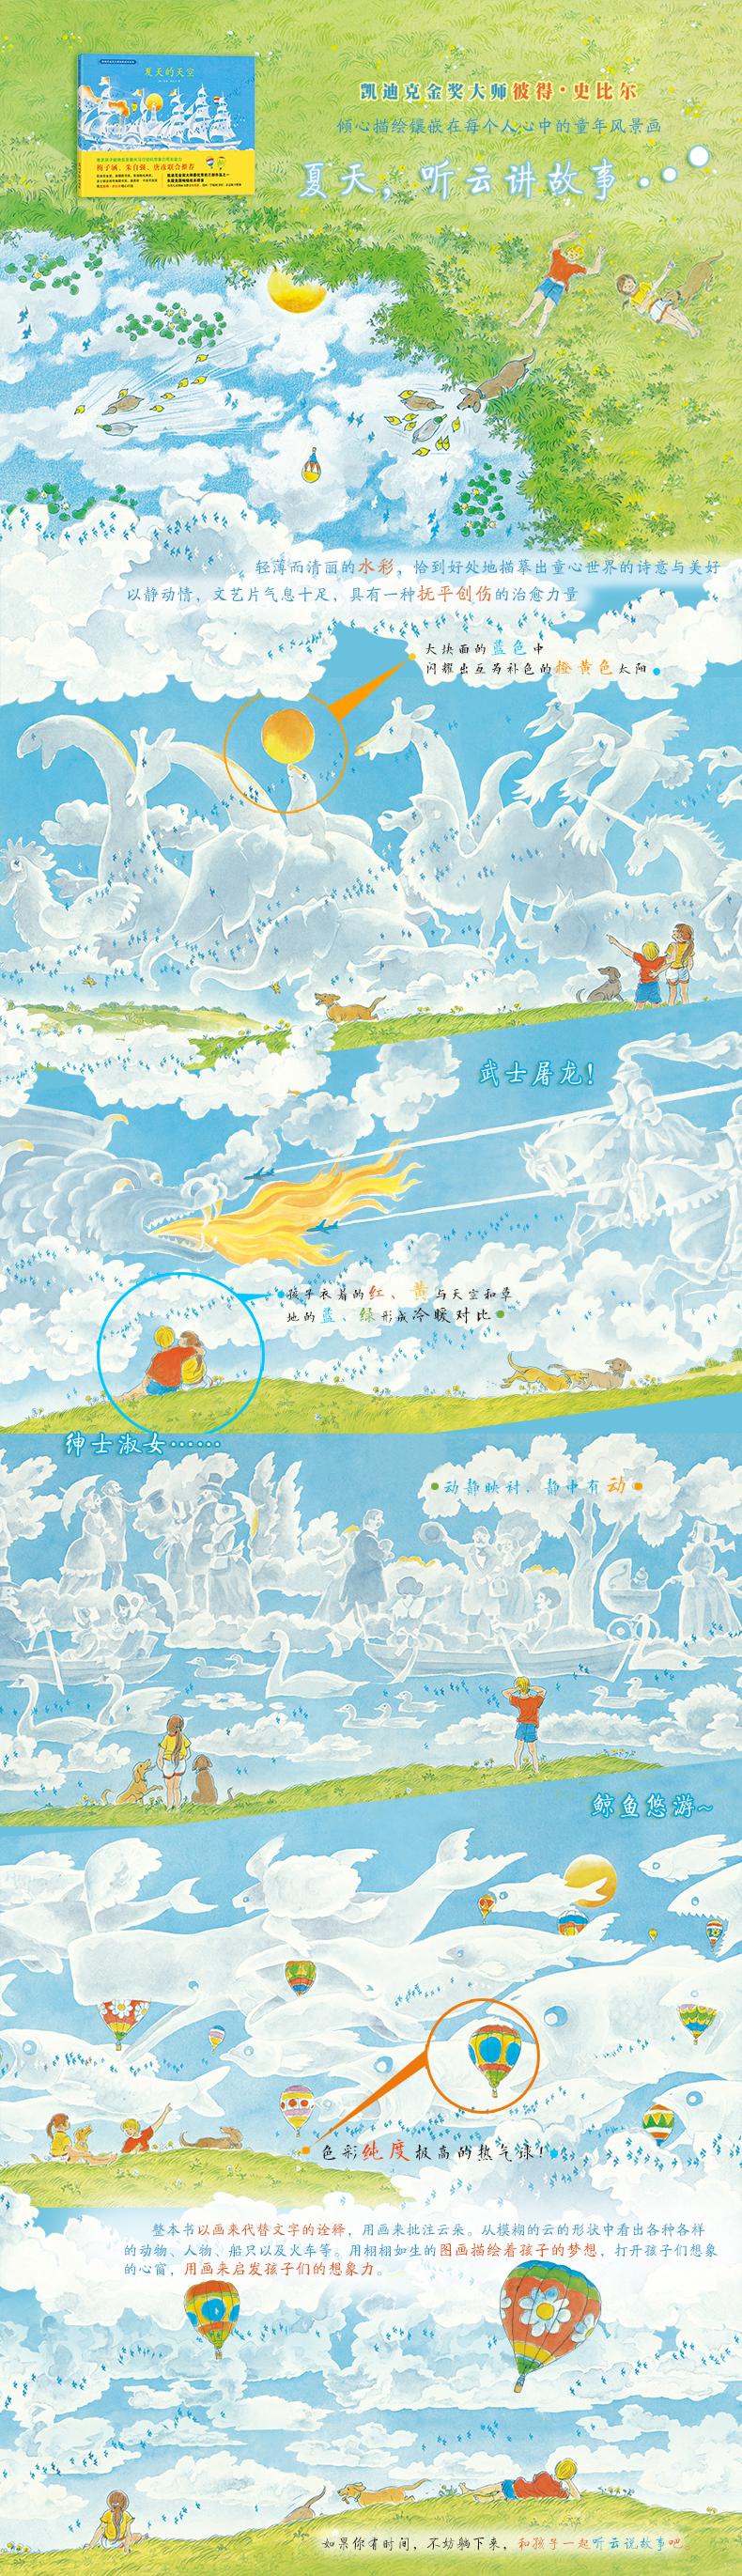 天空水彩手绘鲸鱼